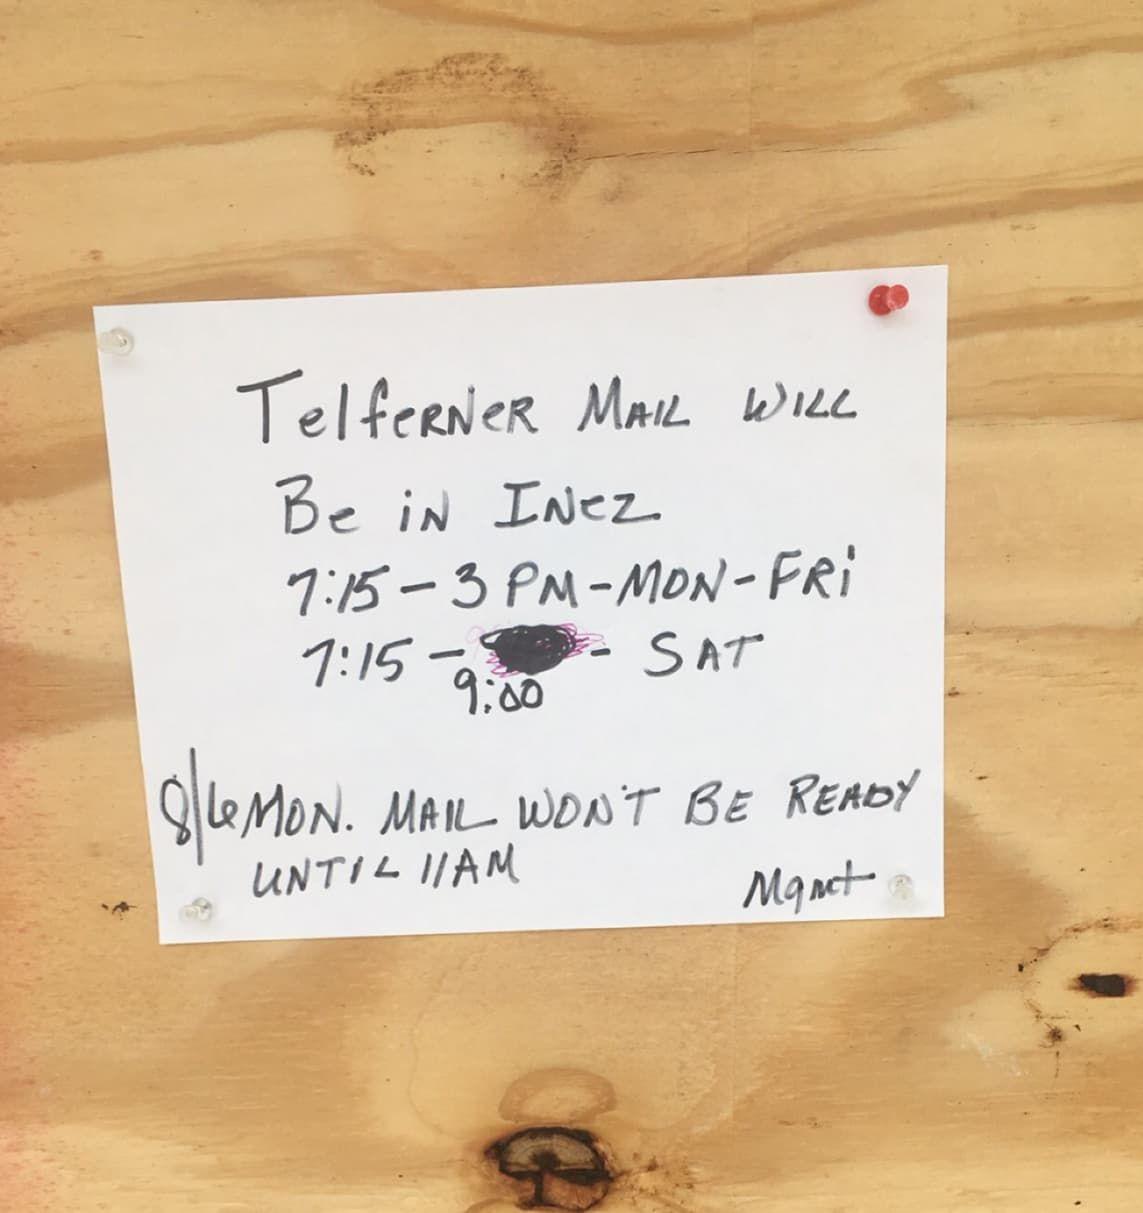 telferner_post_office_notice.jpg